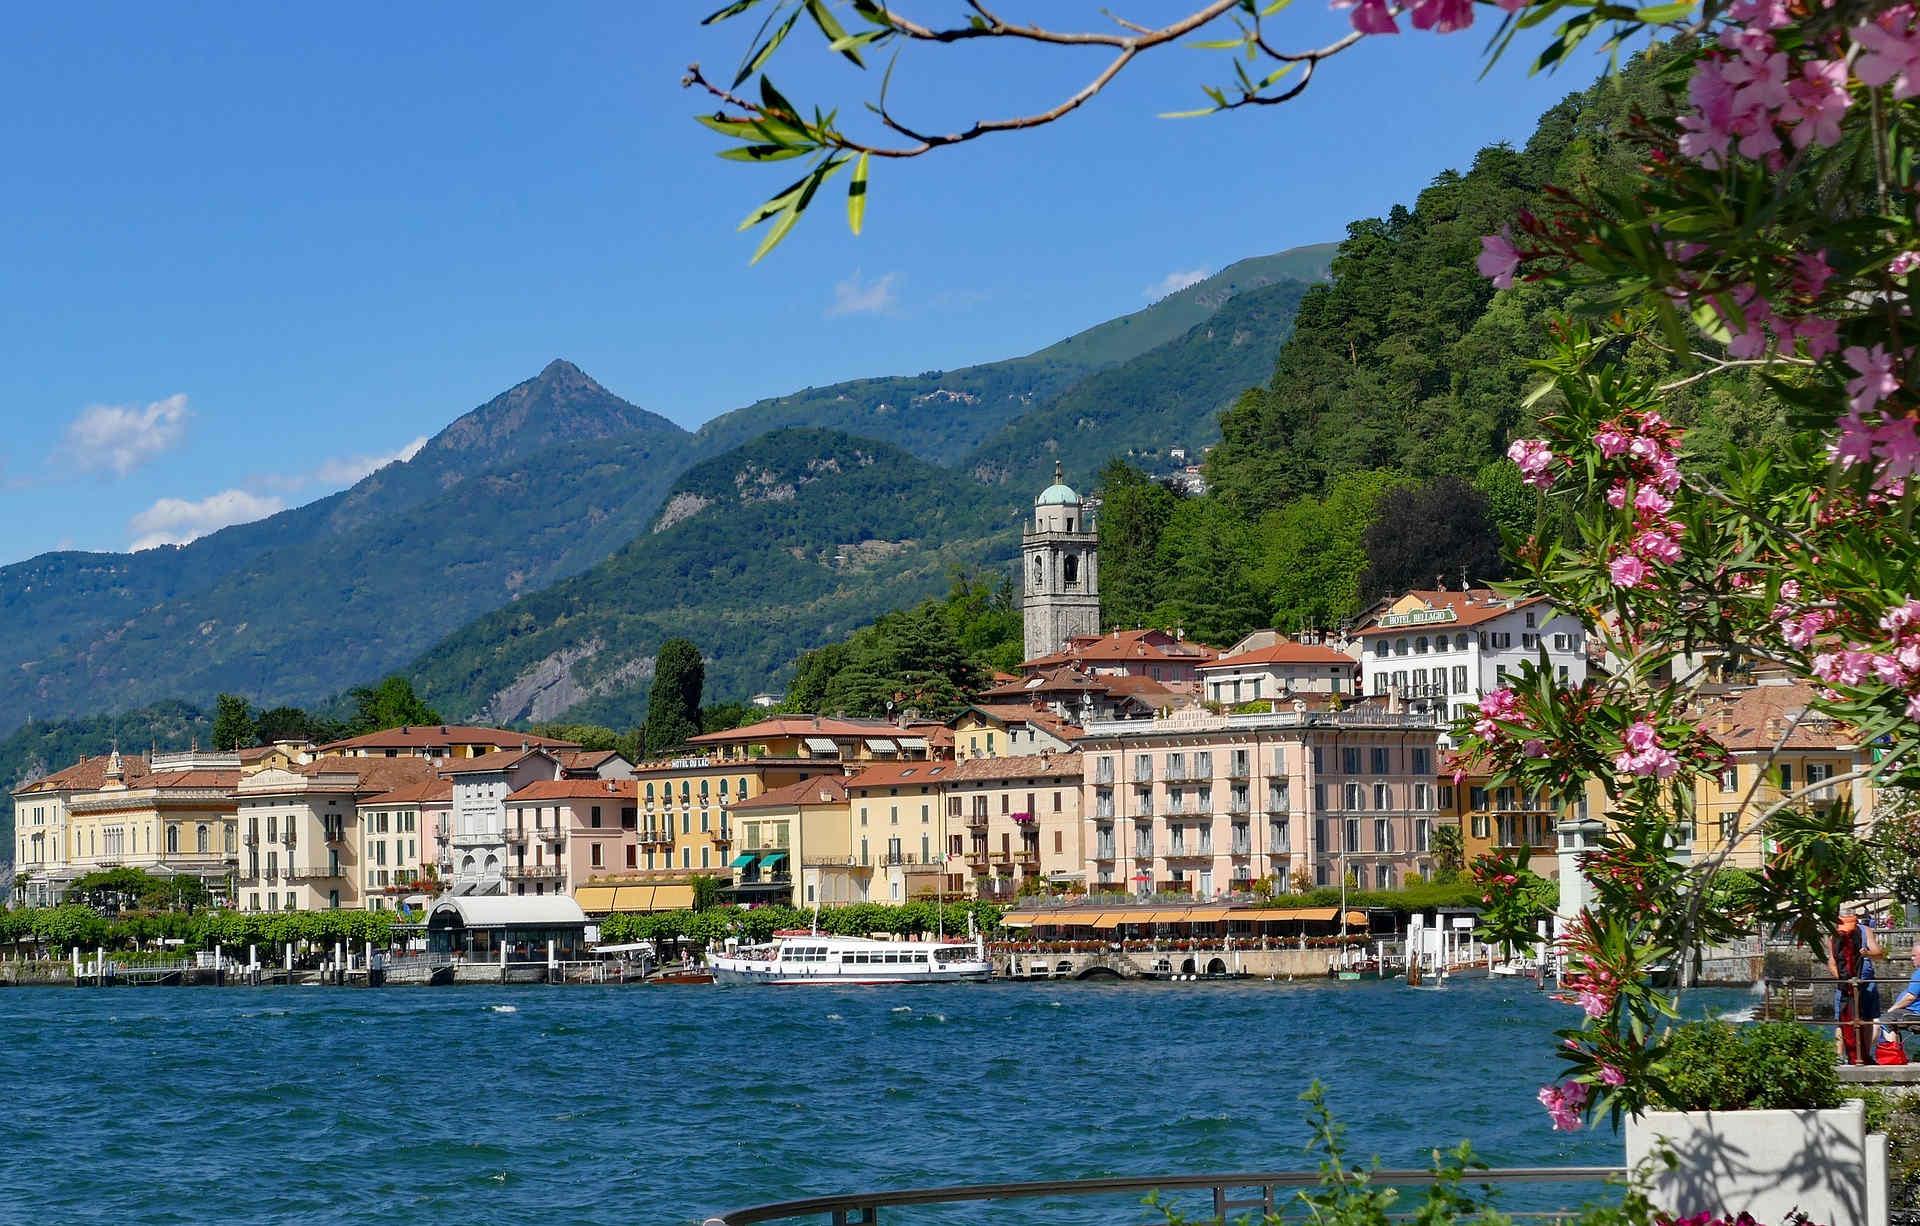 Bellagio Hotel Como Lake